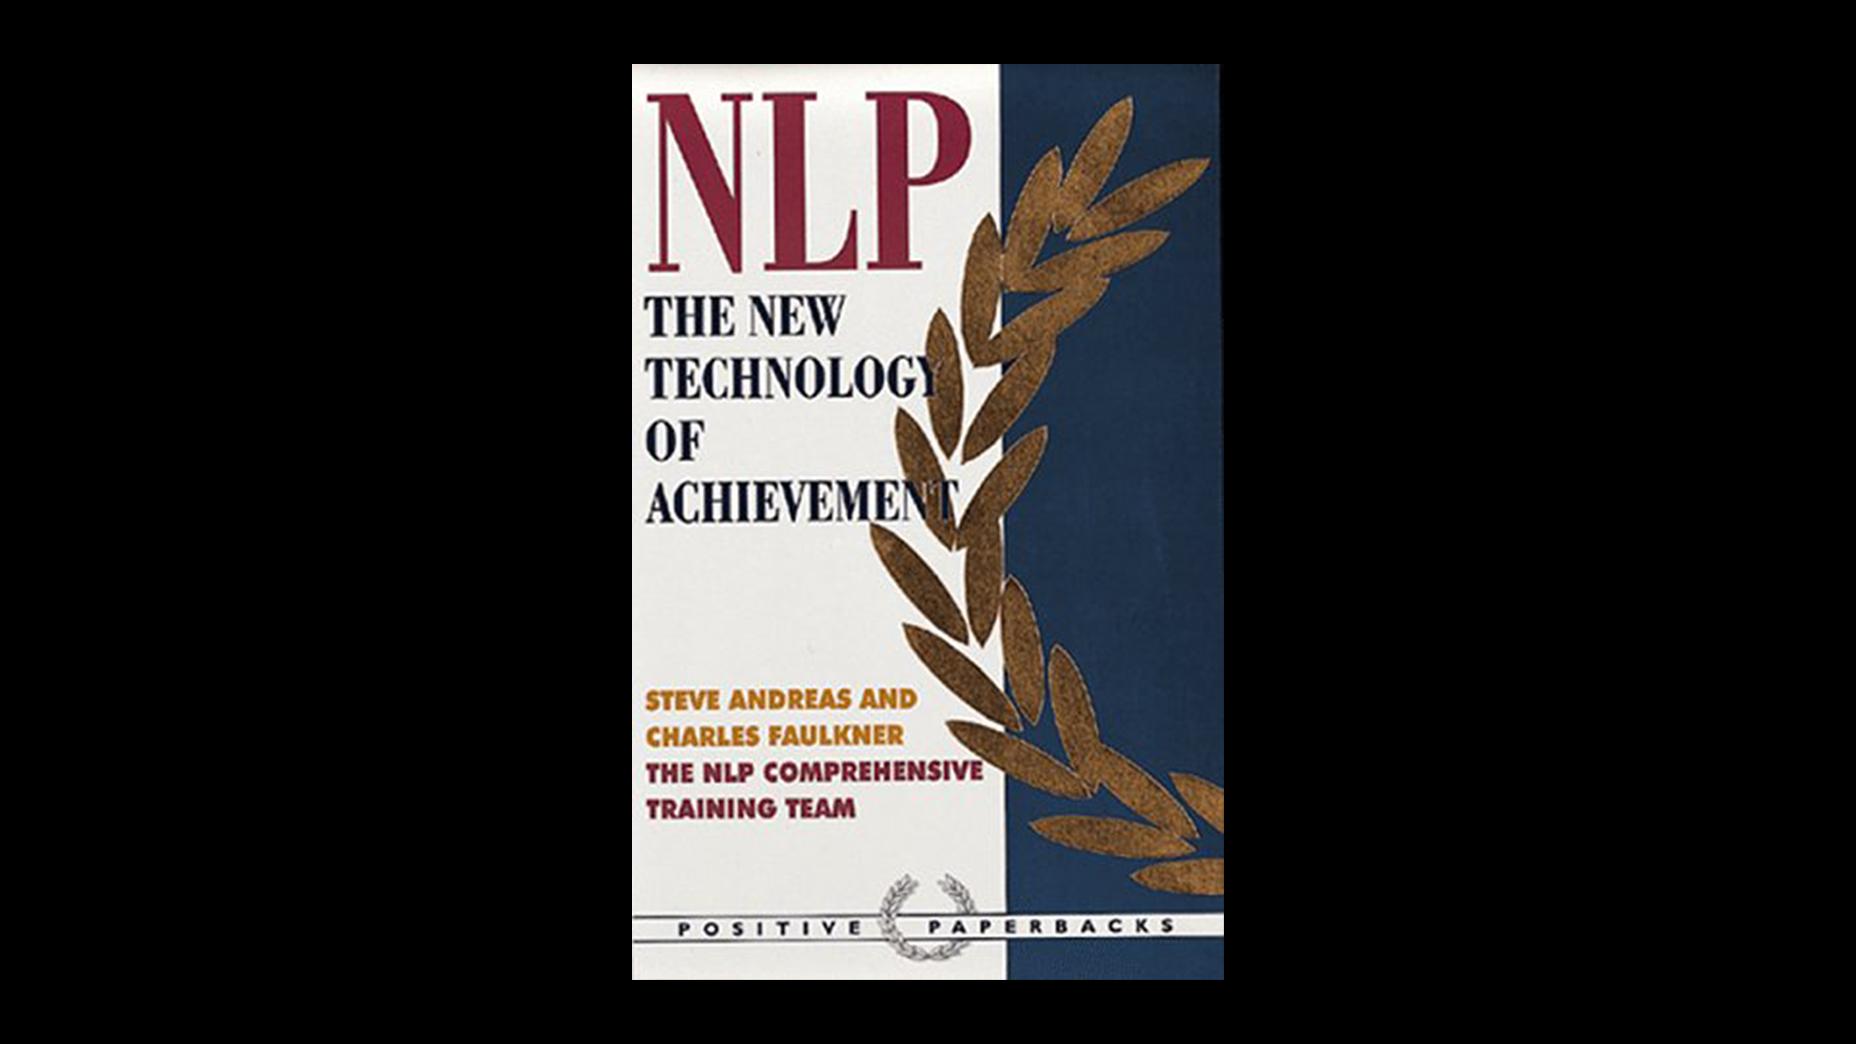 NLP: The New Technology Of Achievement – Steve Andreas & Charles Faulkner